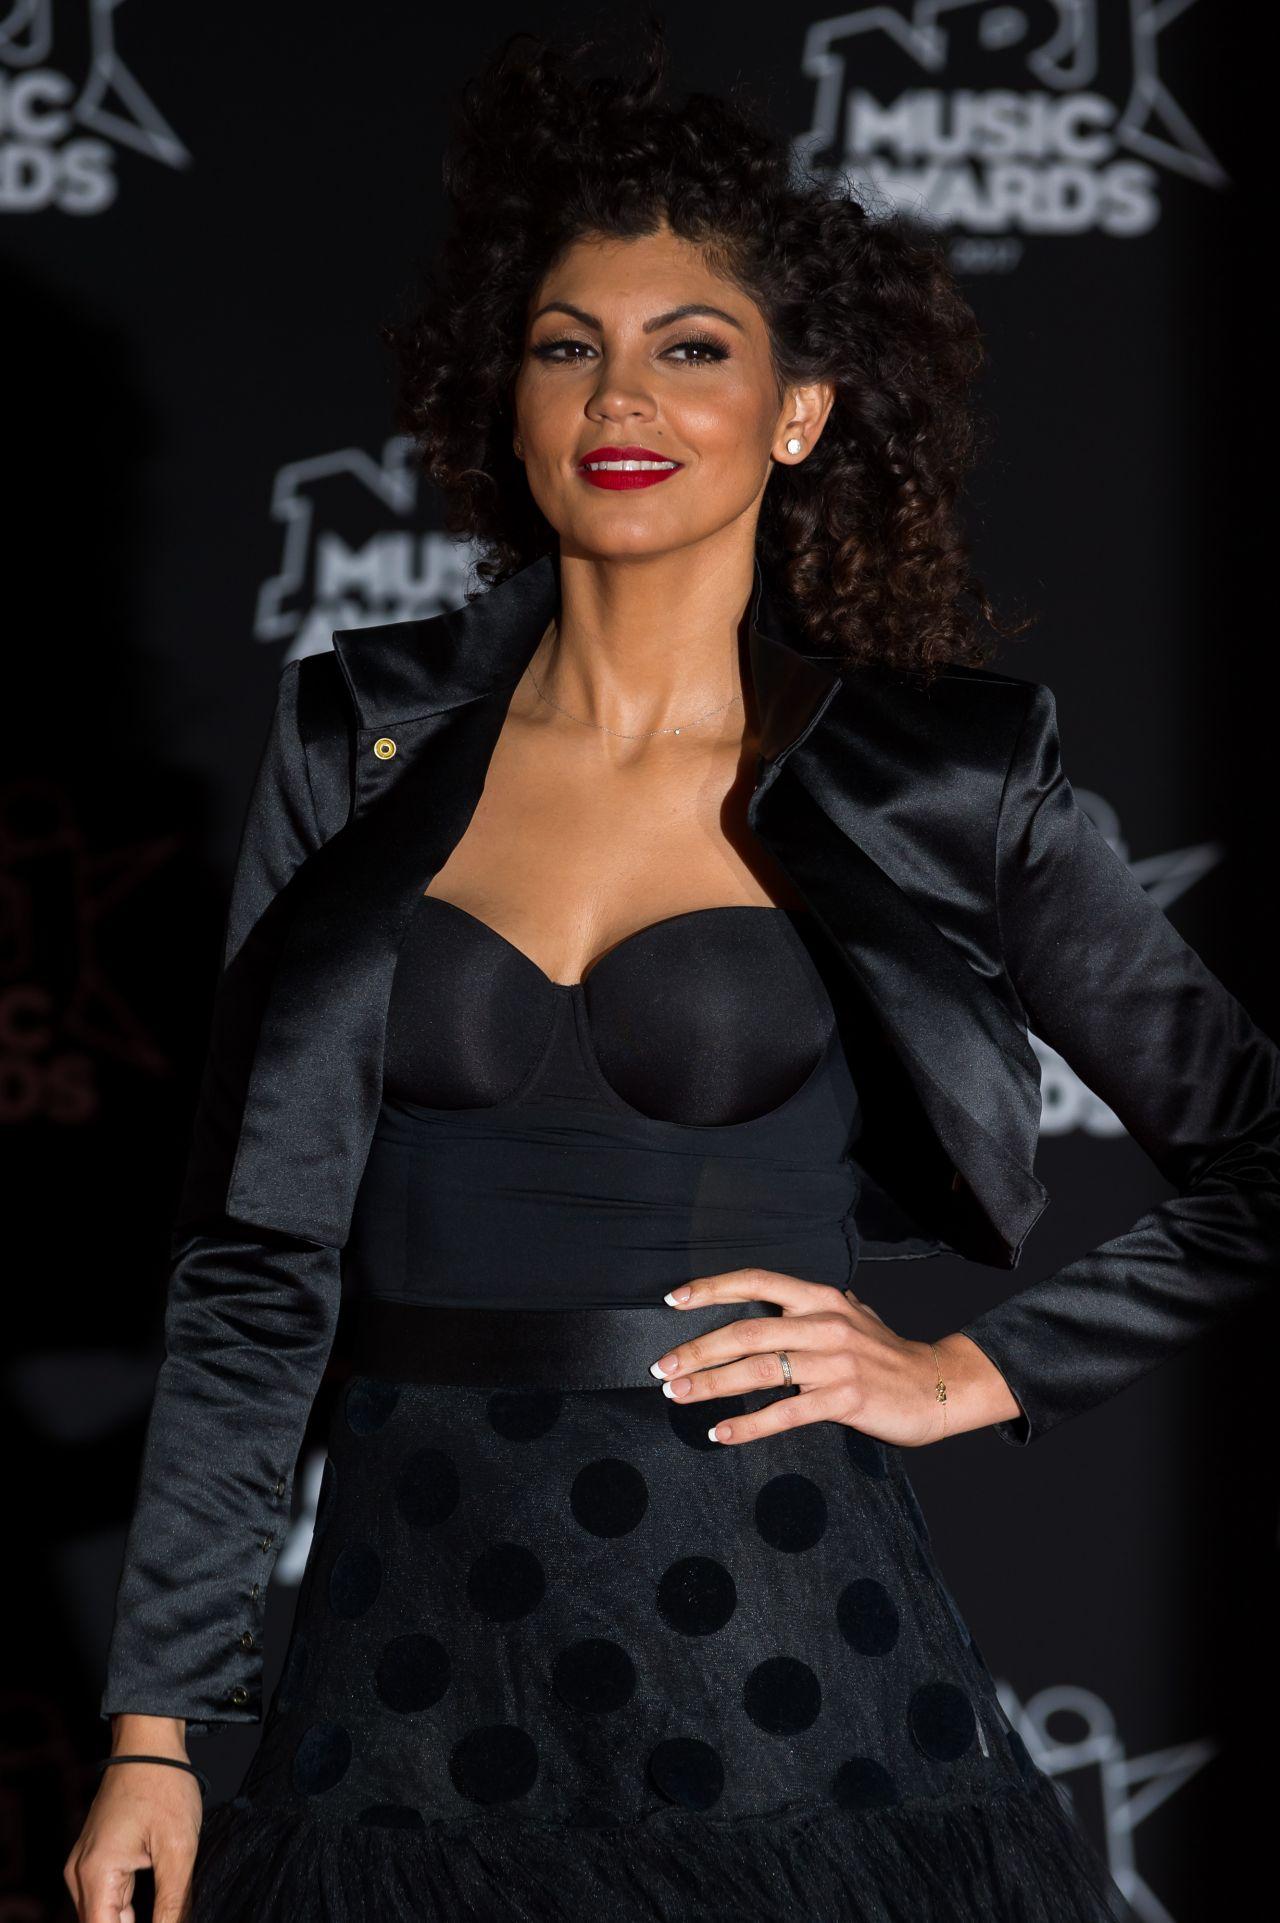 Nawell Madani Nrj Music Awards Ceremony Cannes